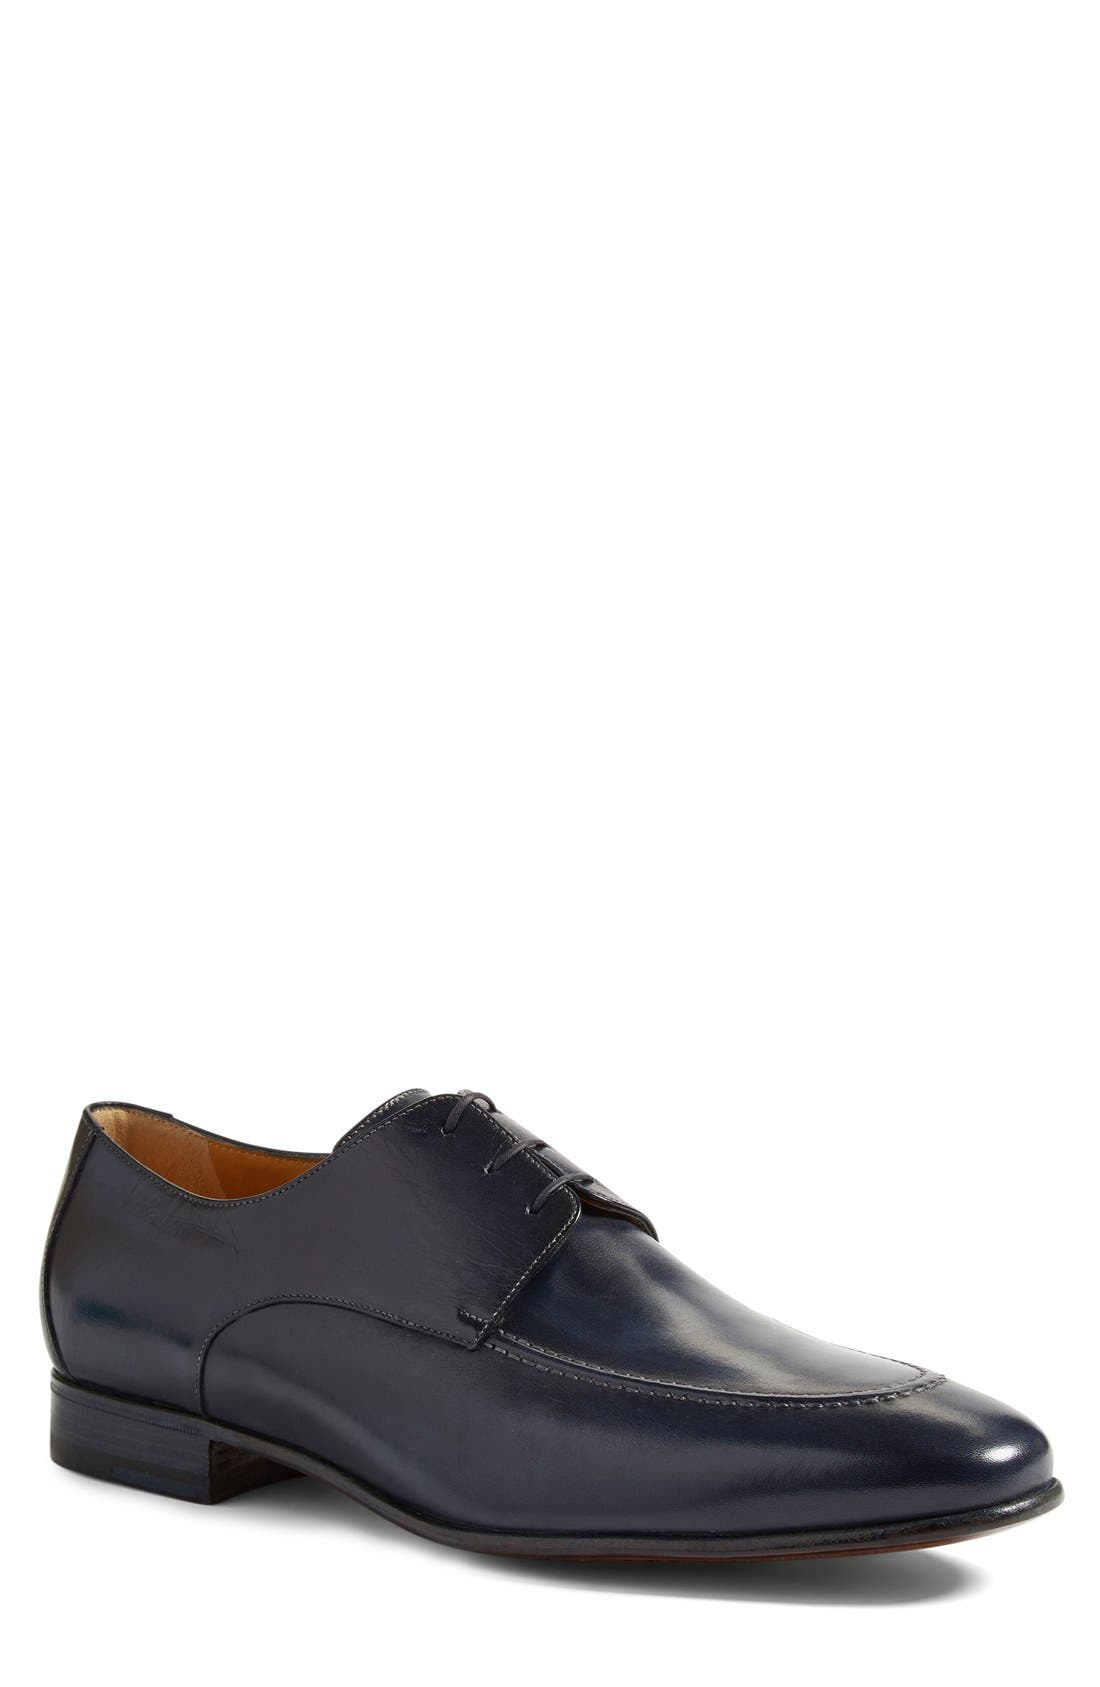 Alternate Image 1 Selected - A. Testoni Apron Toe Derby (Men)